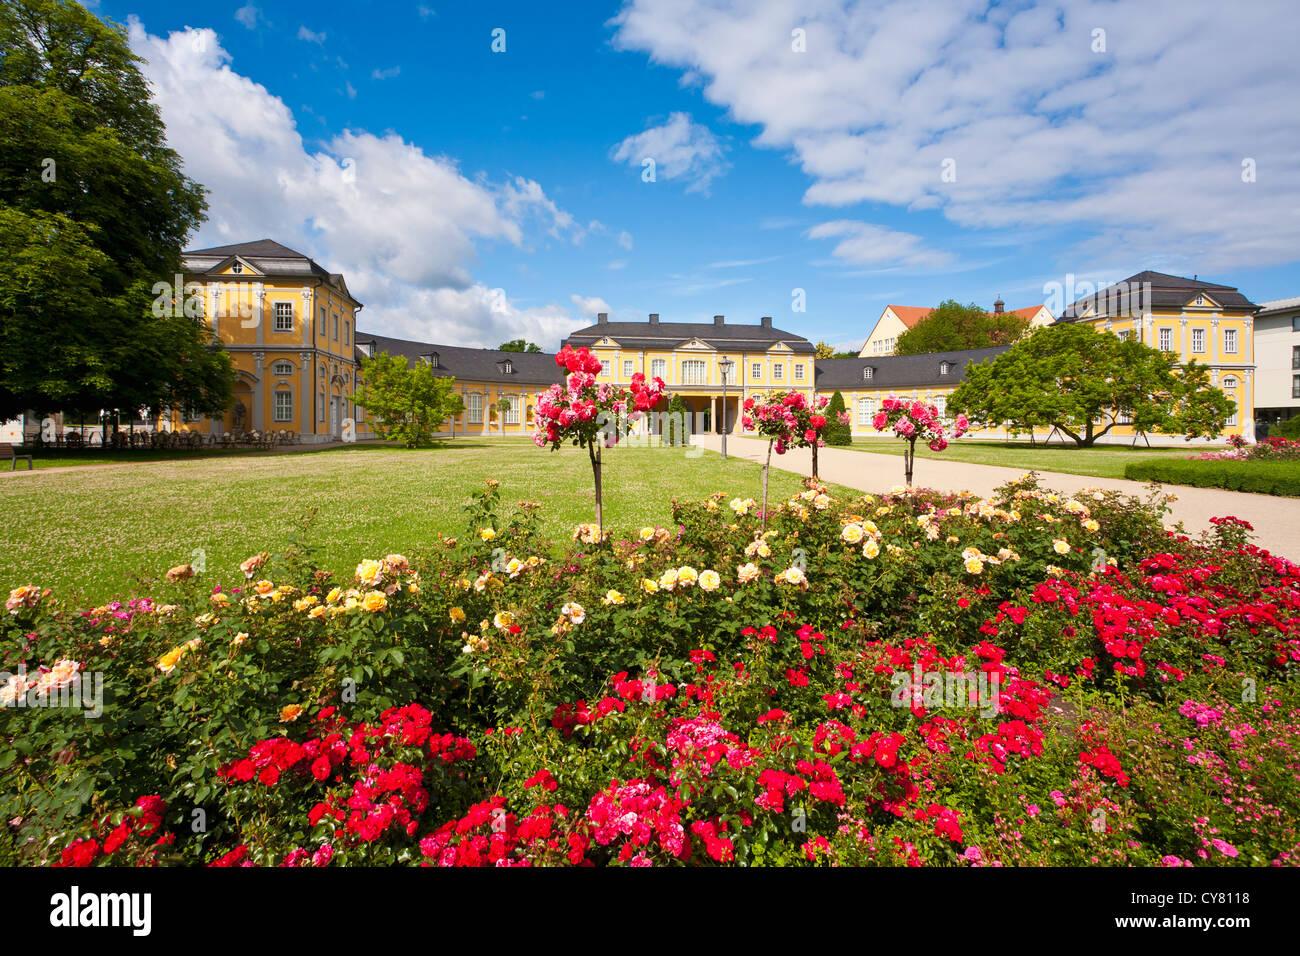 ORANGERY IN GERA, THURINGIA, GERMANY - Stock Image